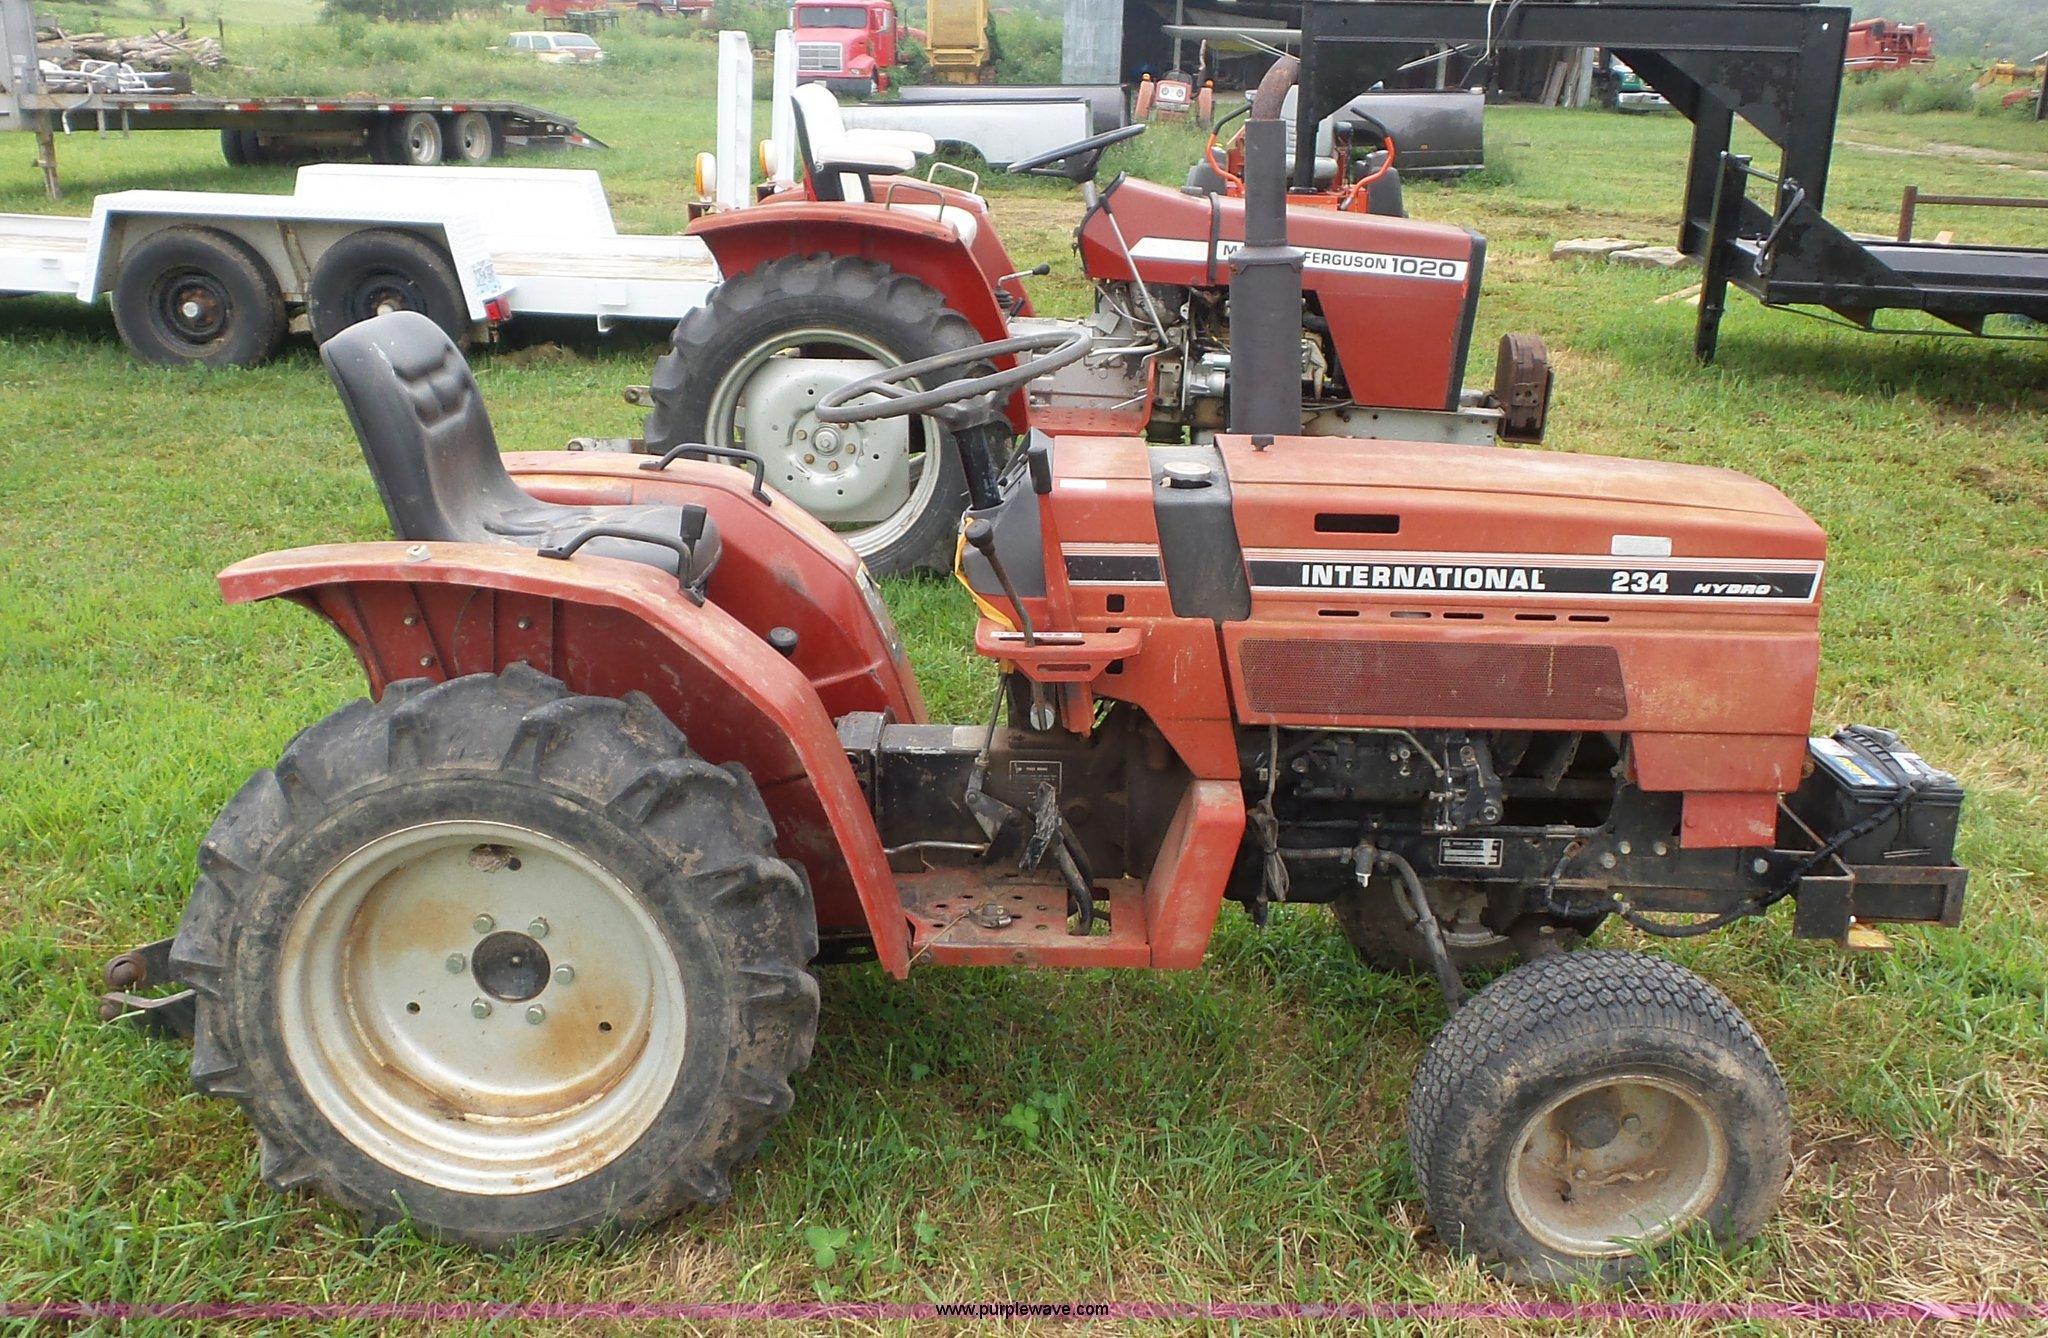 Ih 234 Tractor Manual 1256 Bolens Husky Wiring Diagram Service Array International Steering Tractors Www Topsimages Com Rh